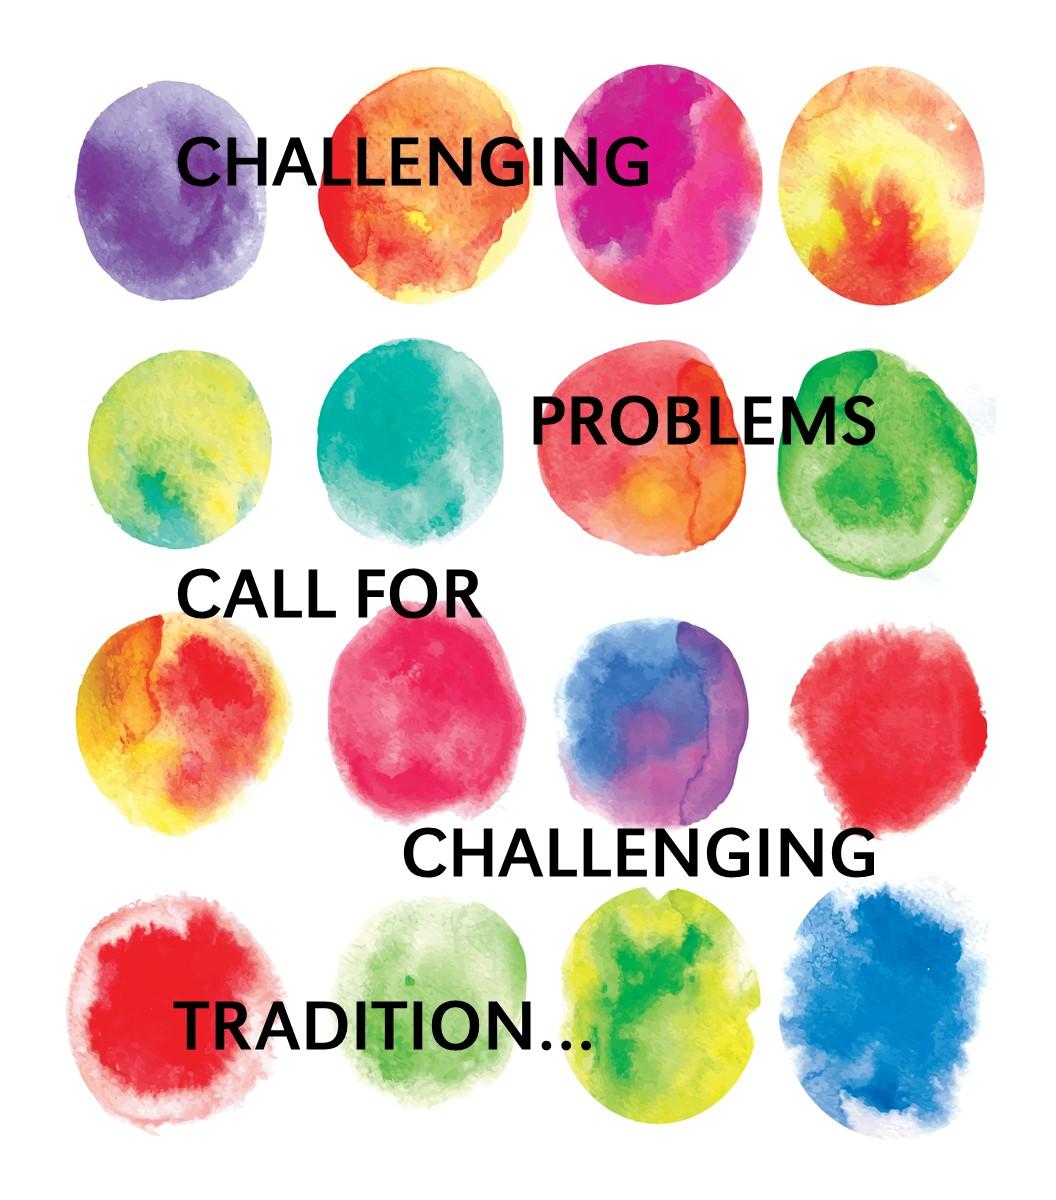 application of critical thinking skills